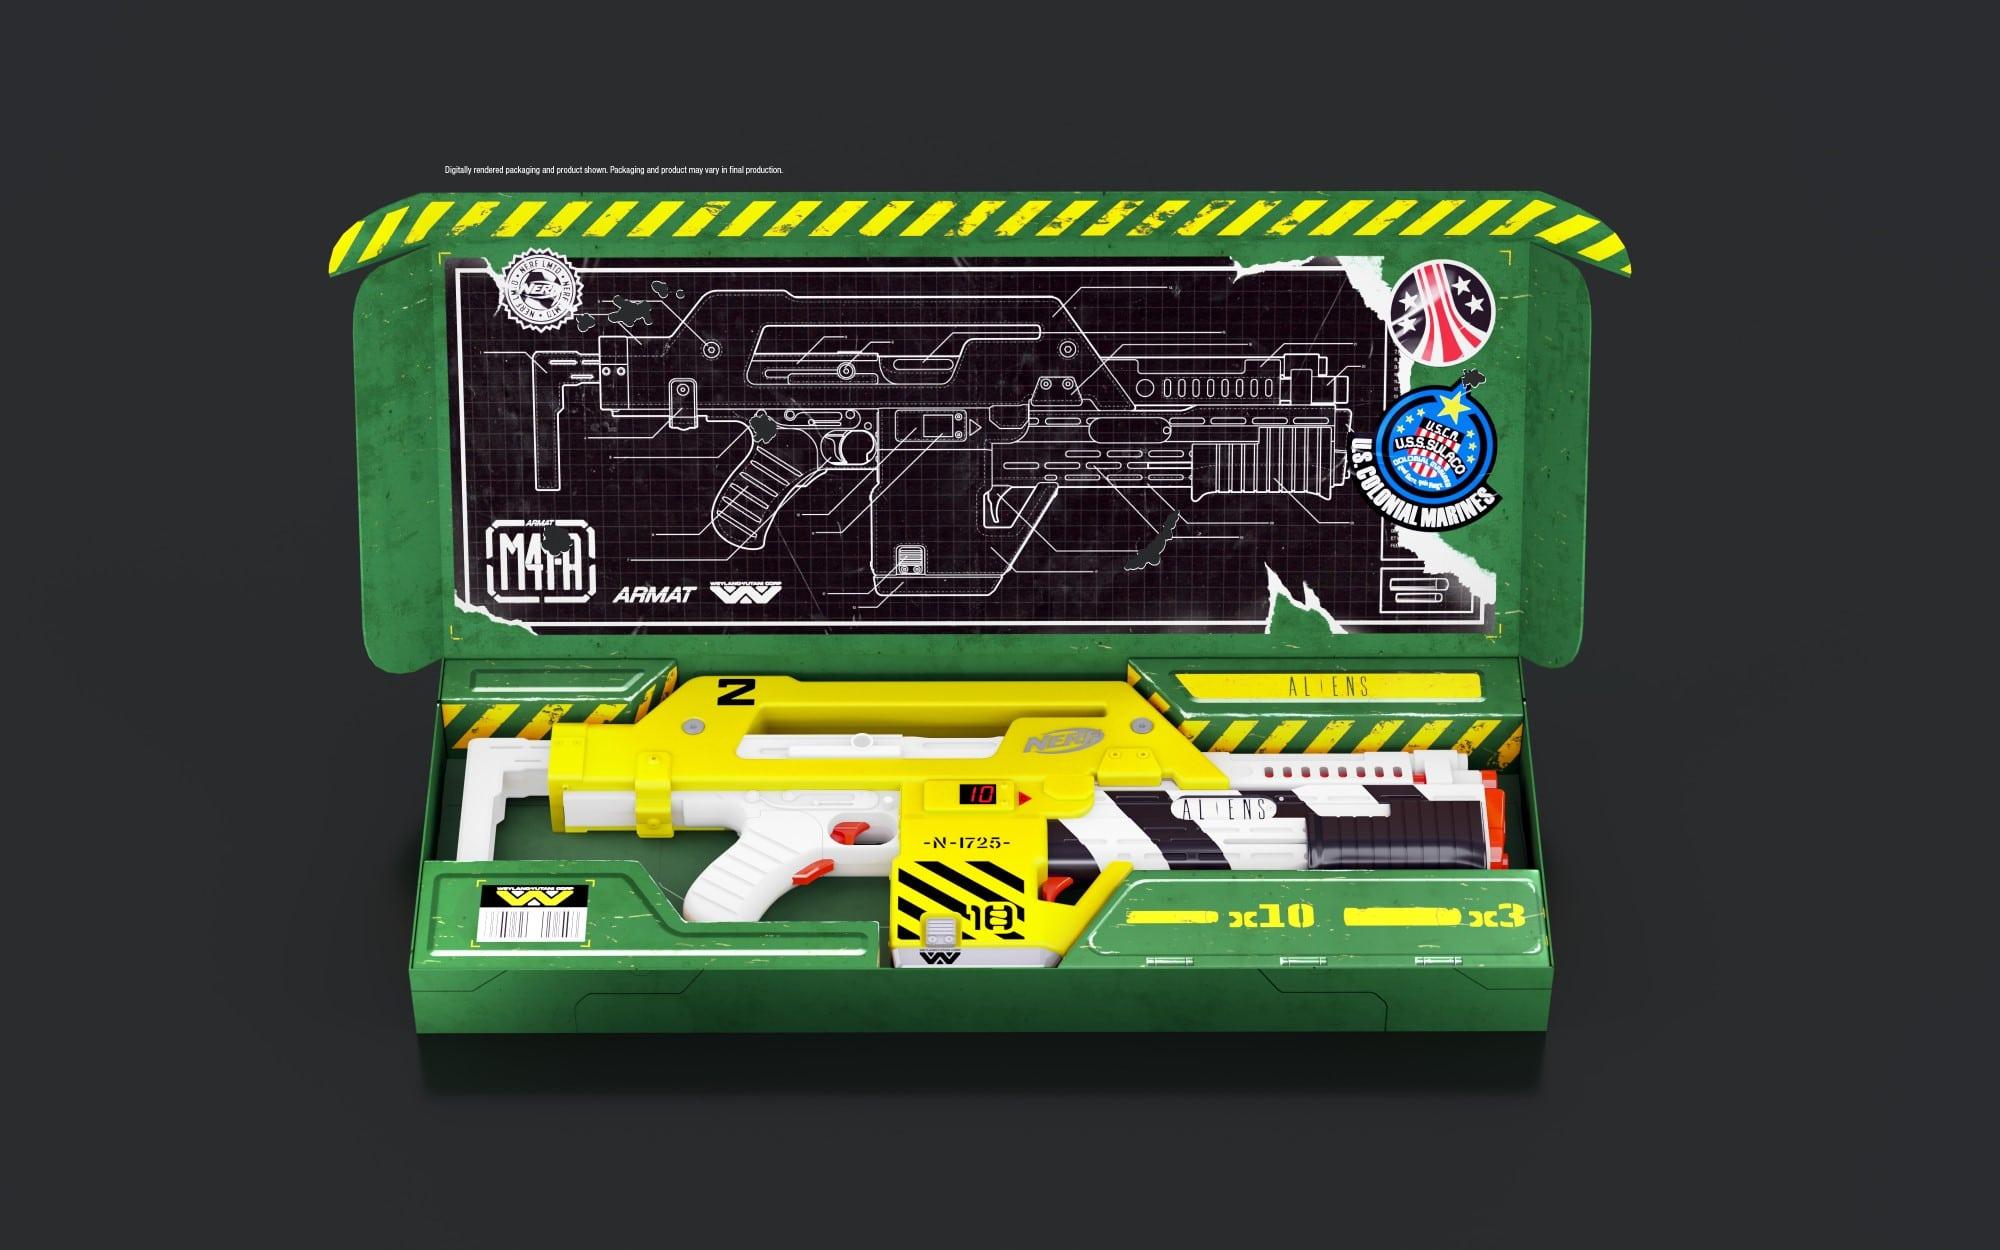 Hasbro creates a Nerf blaster based on the sci-fi film Aliens 22